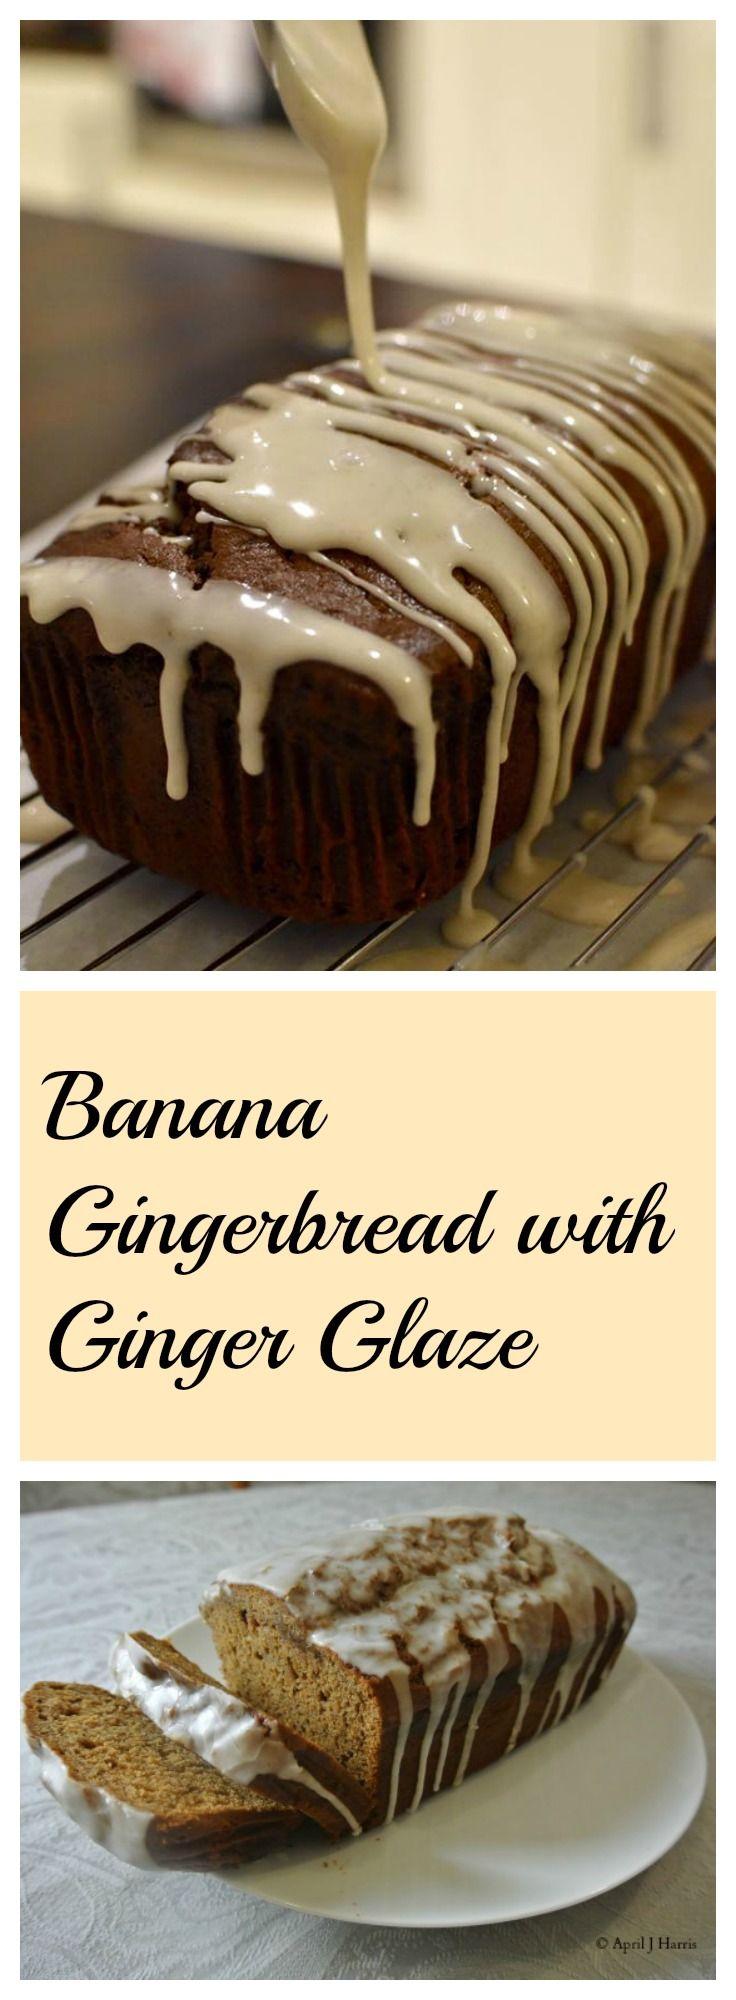 Banana Gingerbread with Ginger Glaze